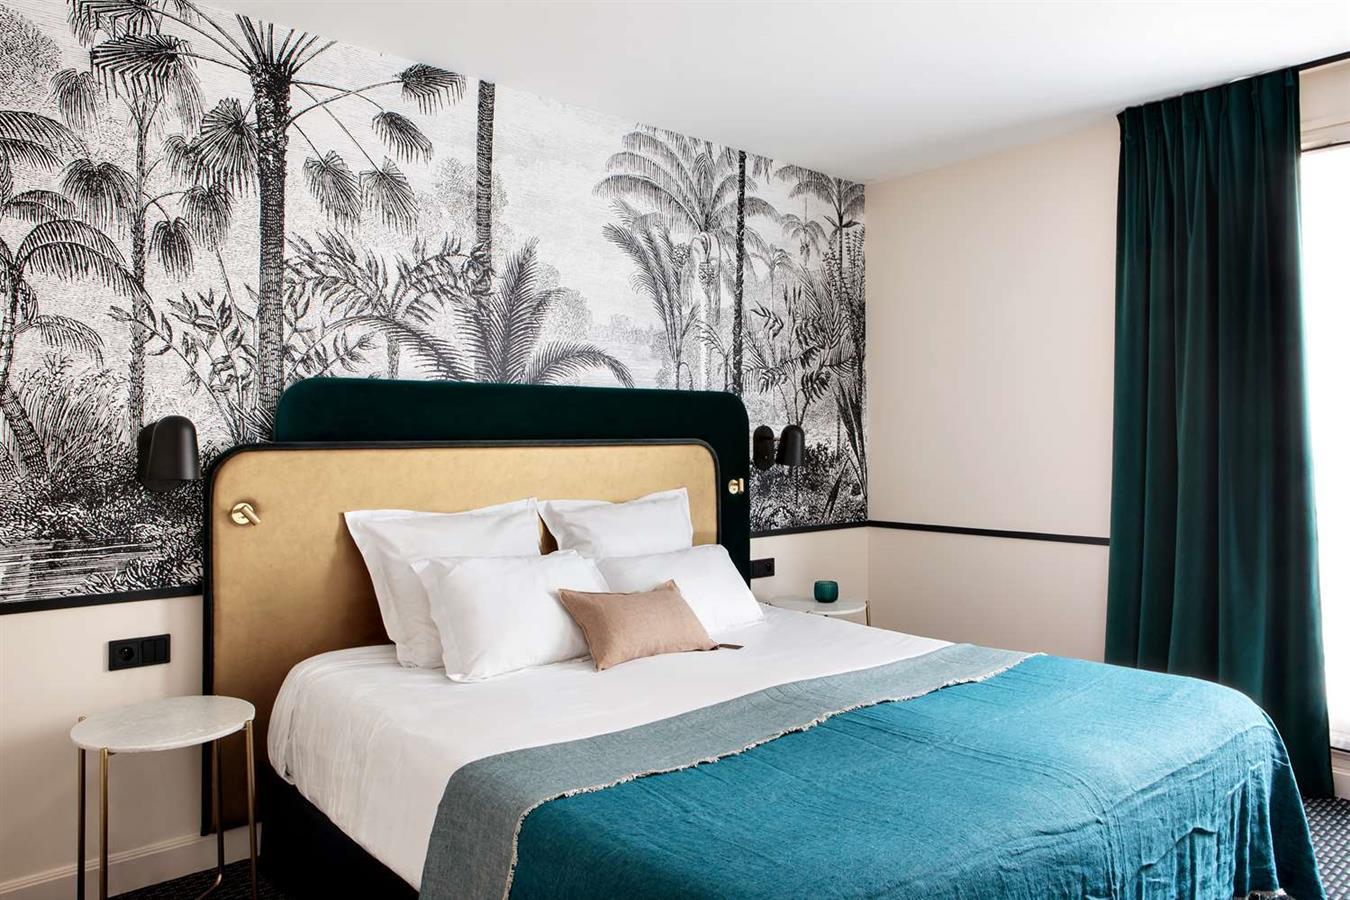 bw hotel du pont wilson lyon prenota online best western. Black Bedroom Furniture Sets. Home Design Ideas